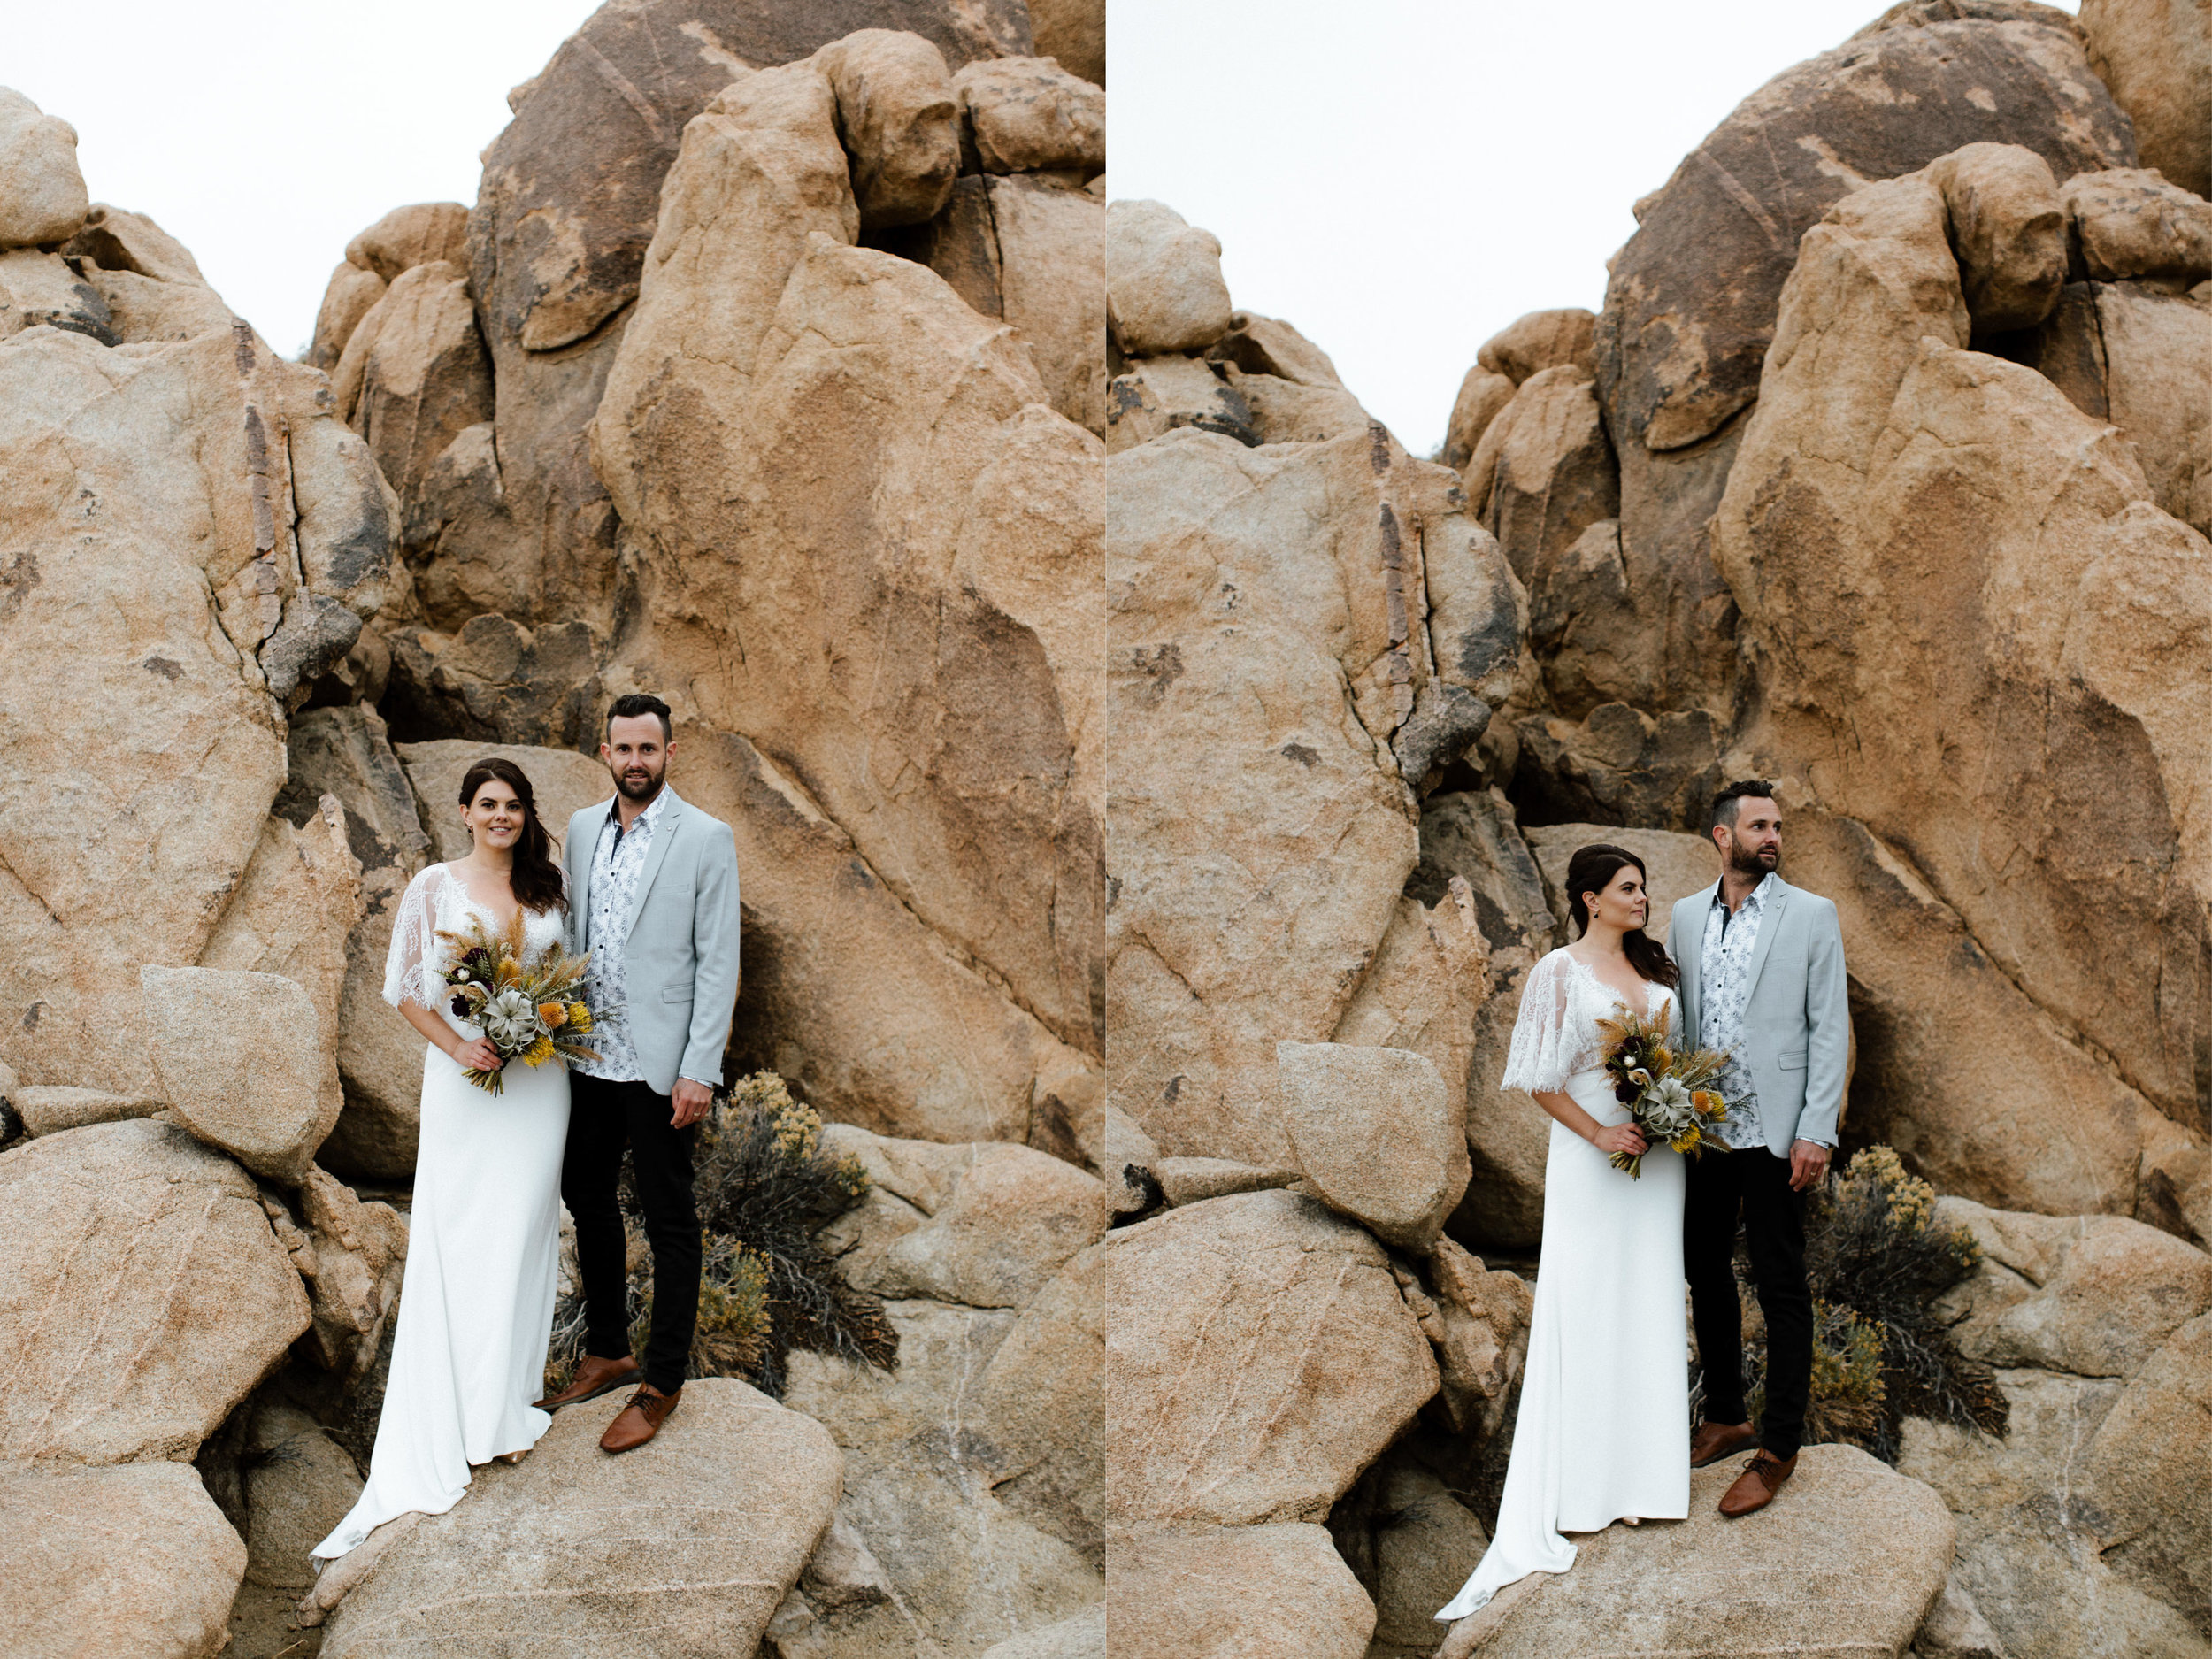 Joshua Tree America Elopement Wedding 7.jpg